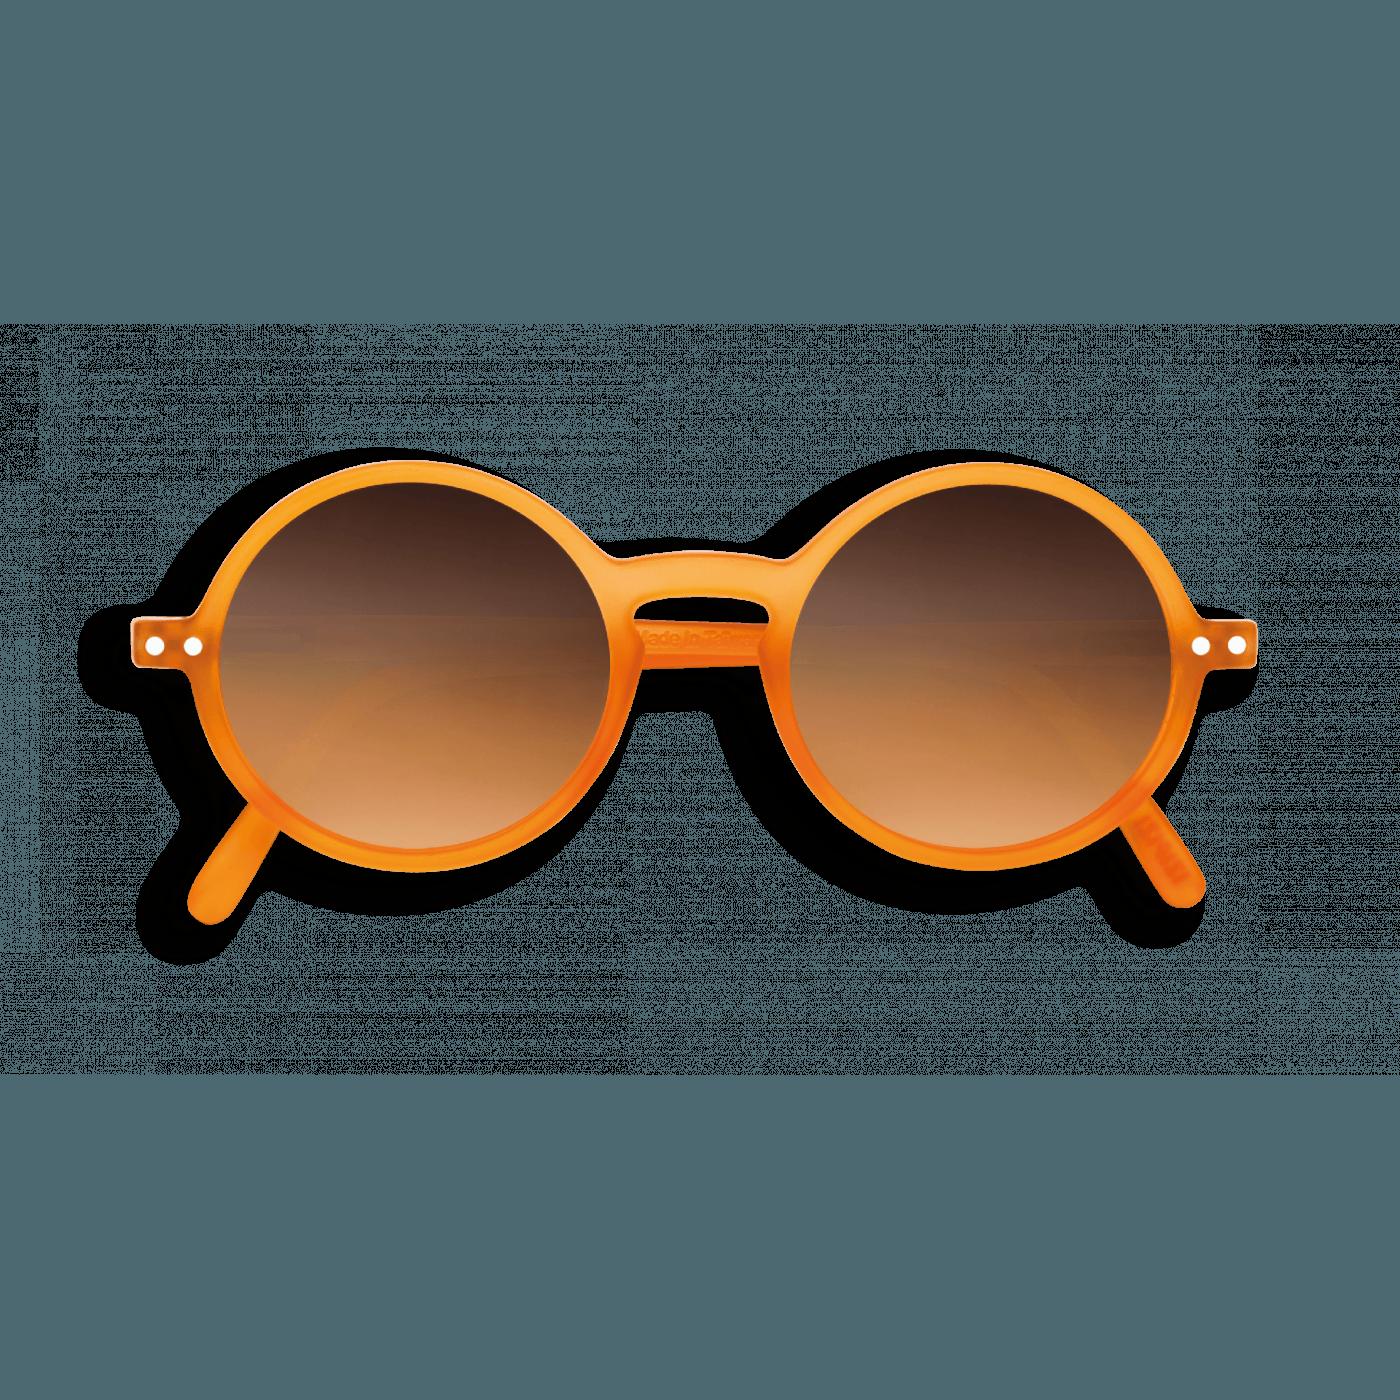 Izipizi # G Sunglasses Orange Flash